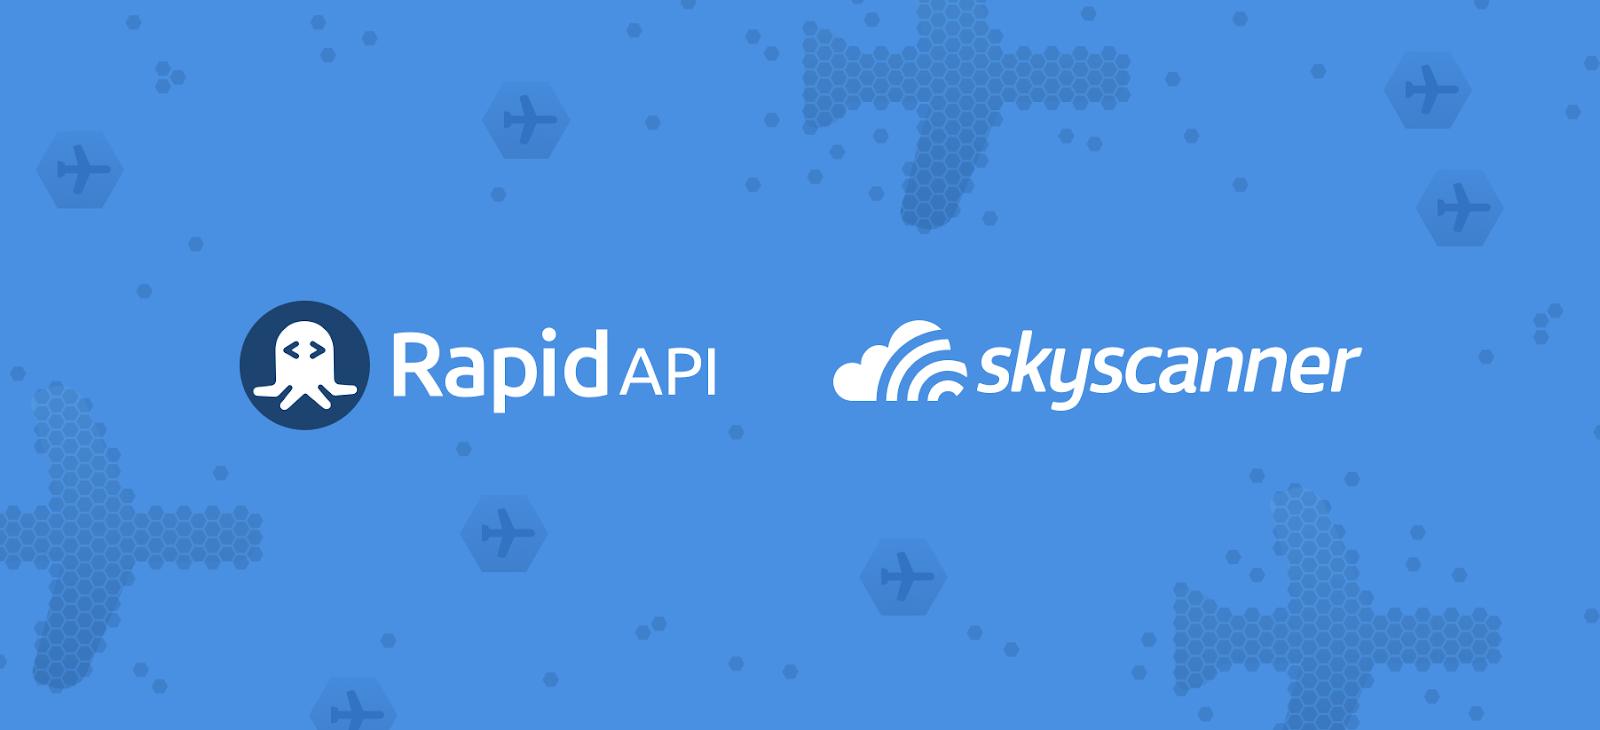 rapidapi and skyscanner